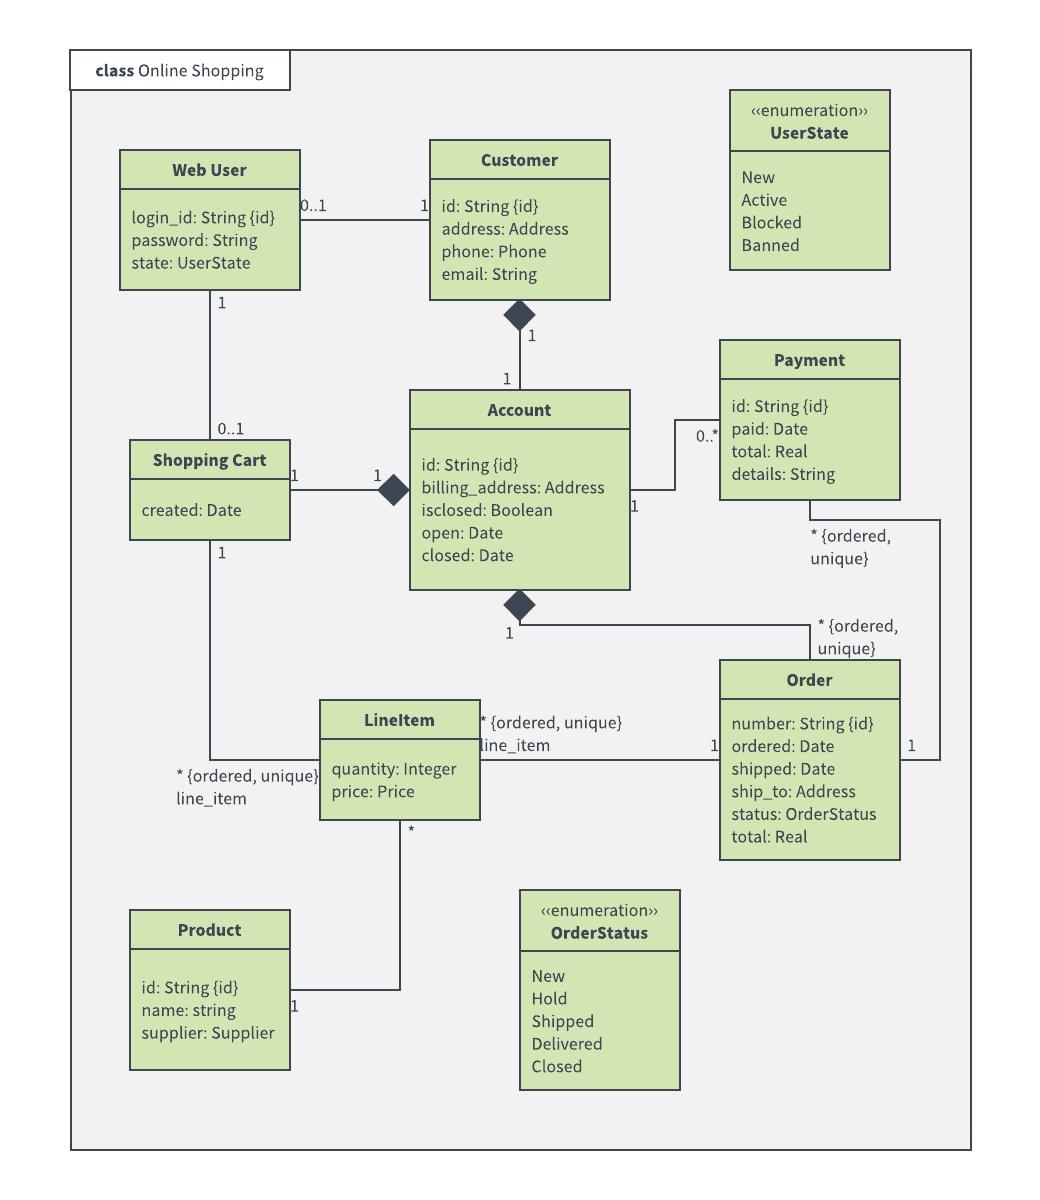 online shopping class diagram example [ 1040 x 1200 Pixel ]